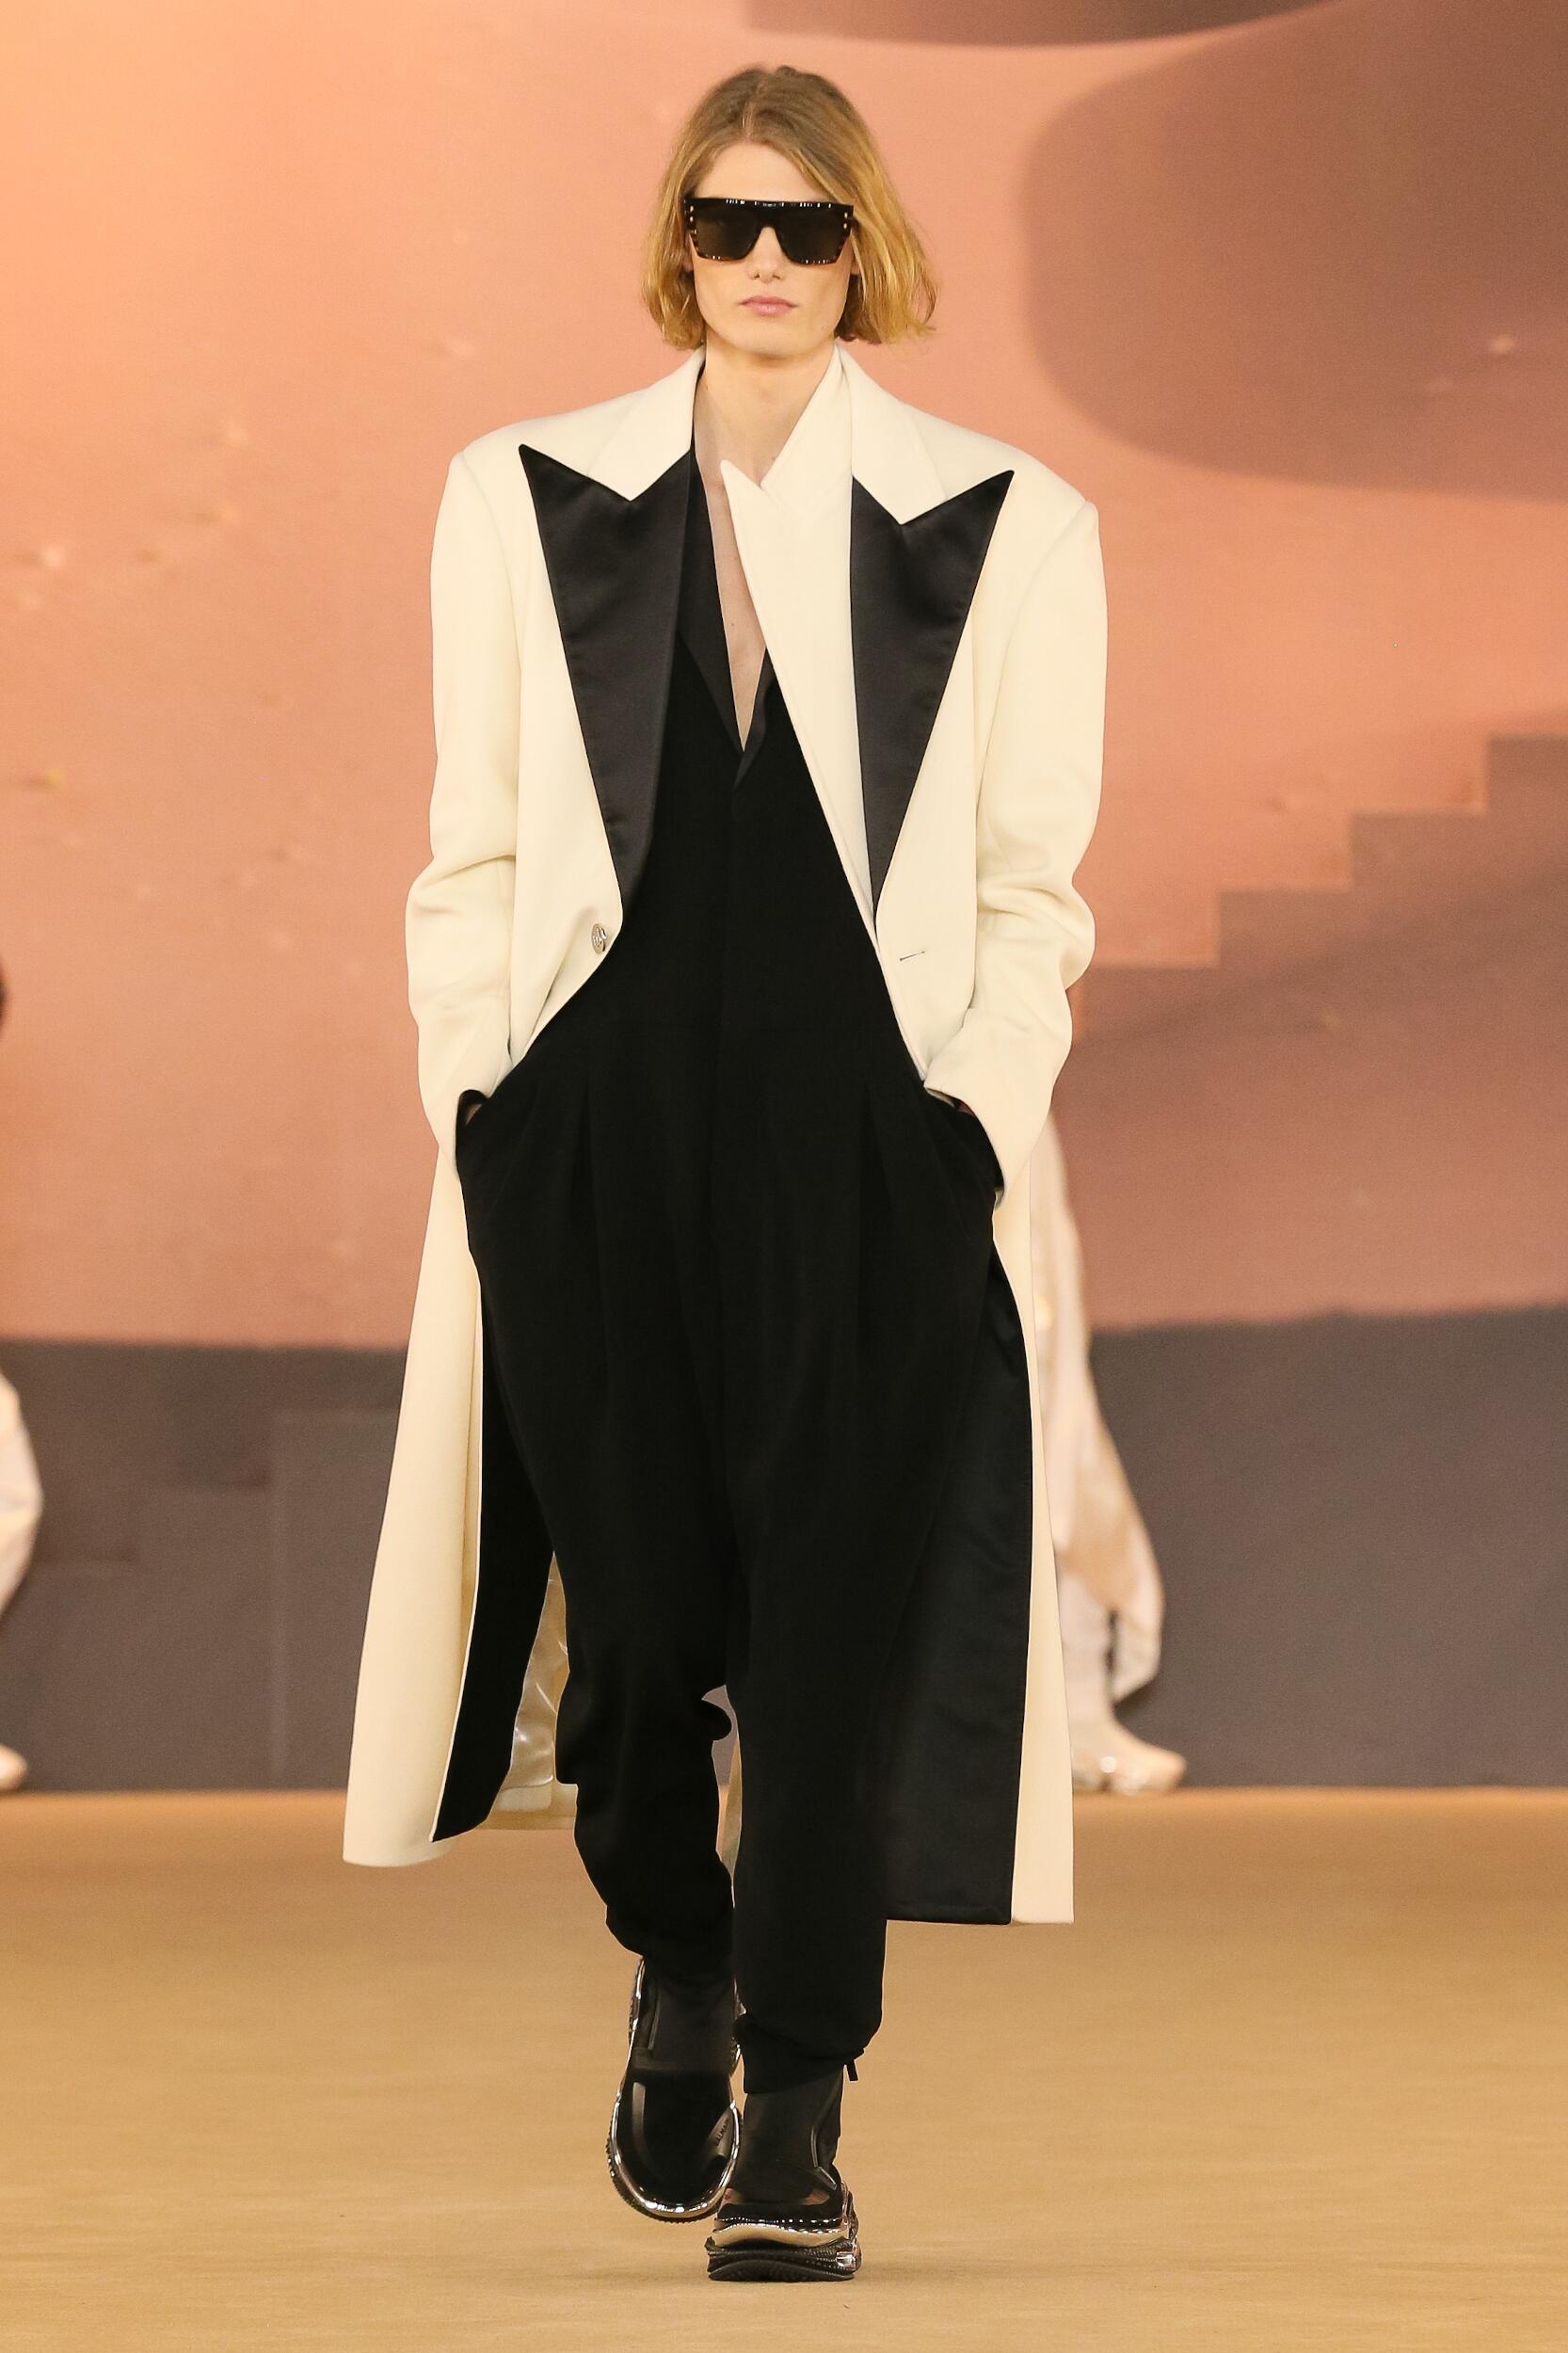 Fall Winter Fashion Trends 2020 Balmain